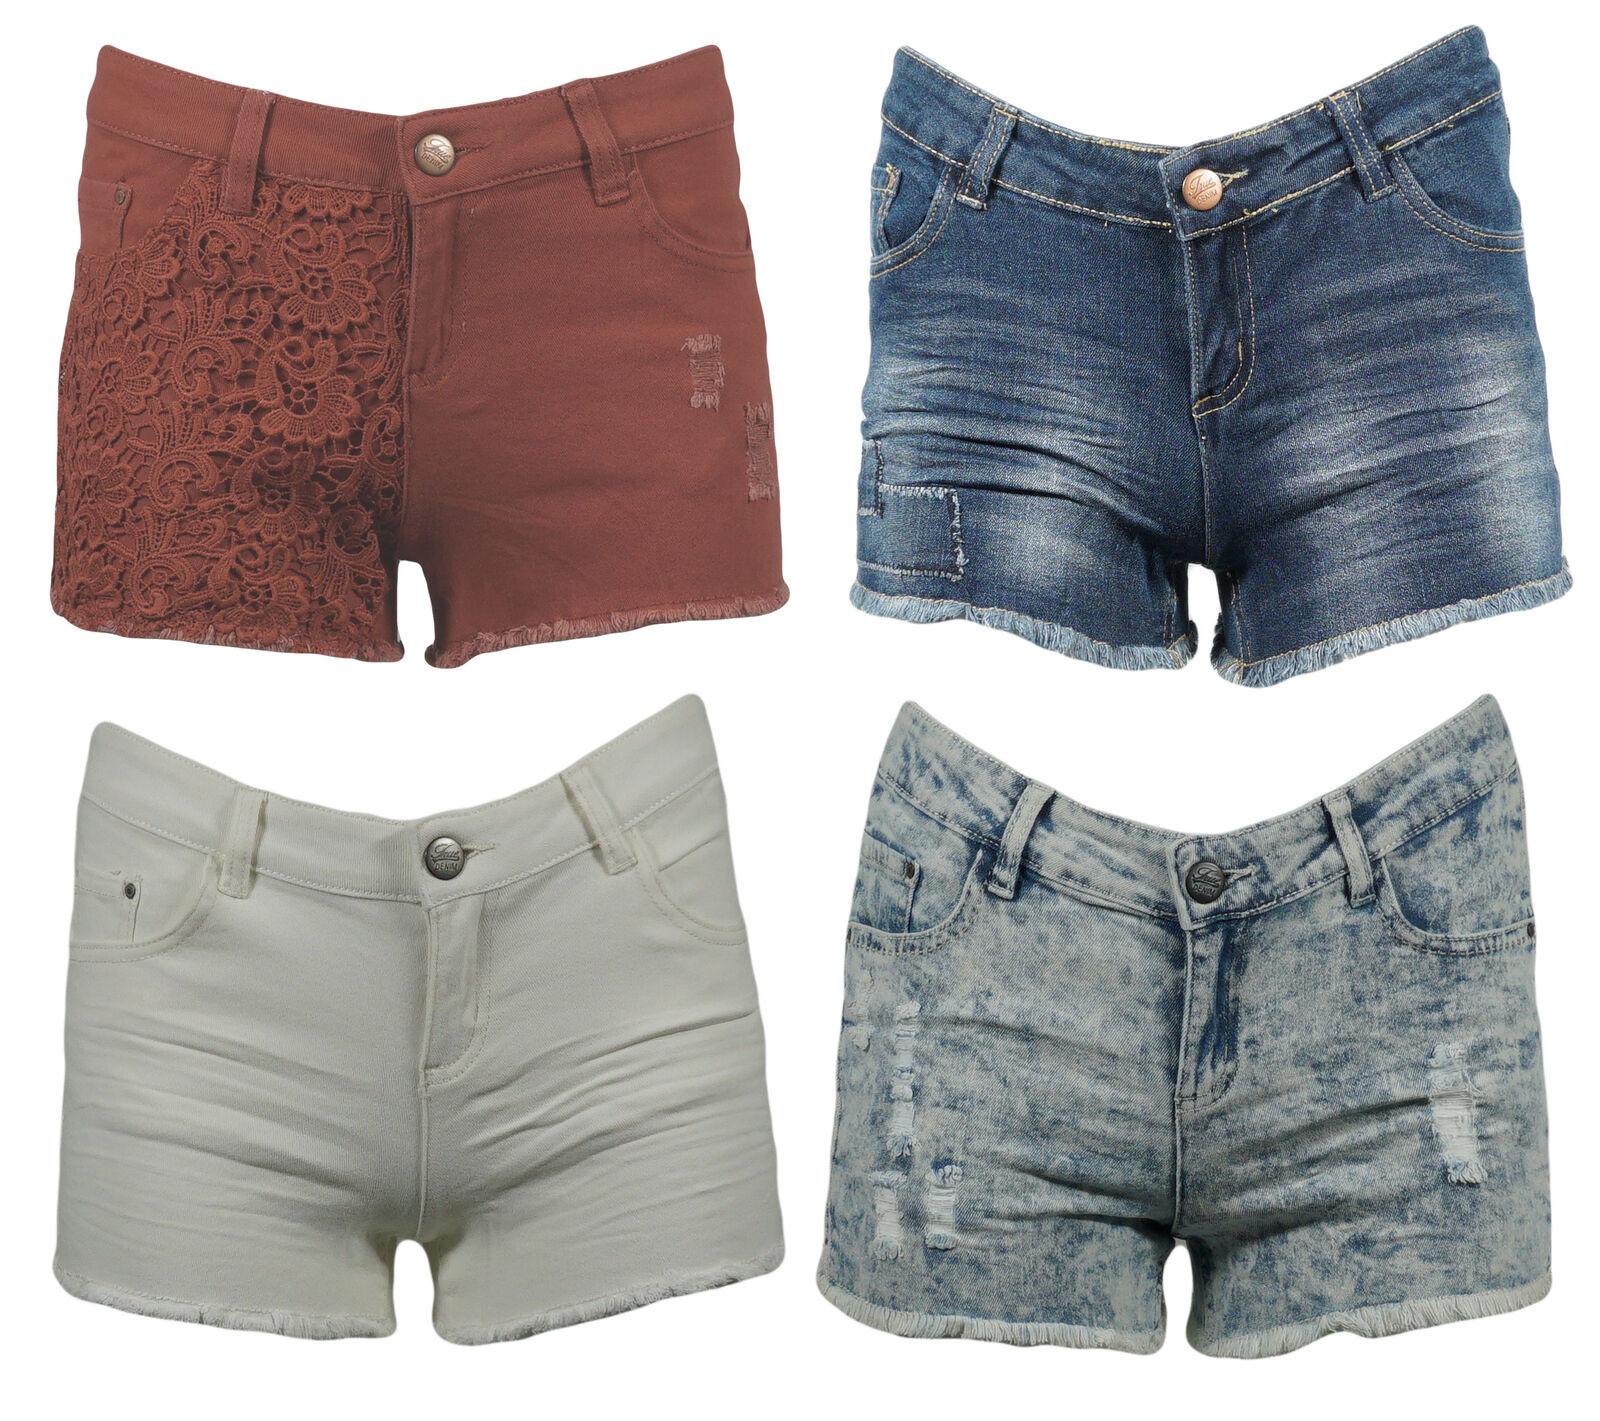 3514cce94dc4eb Kurze Jeanshose Damen Sommer Test Vergleich +++ Kurze Jeanshose ...